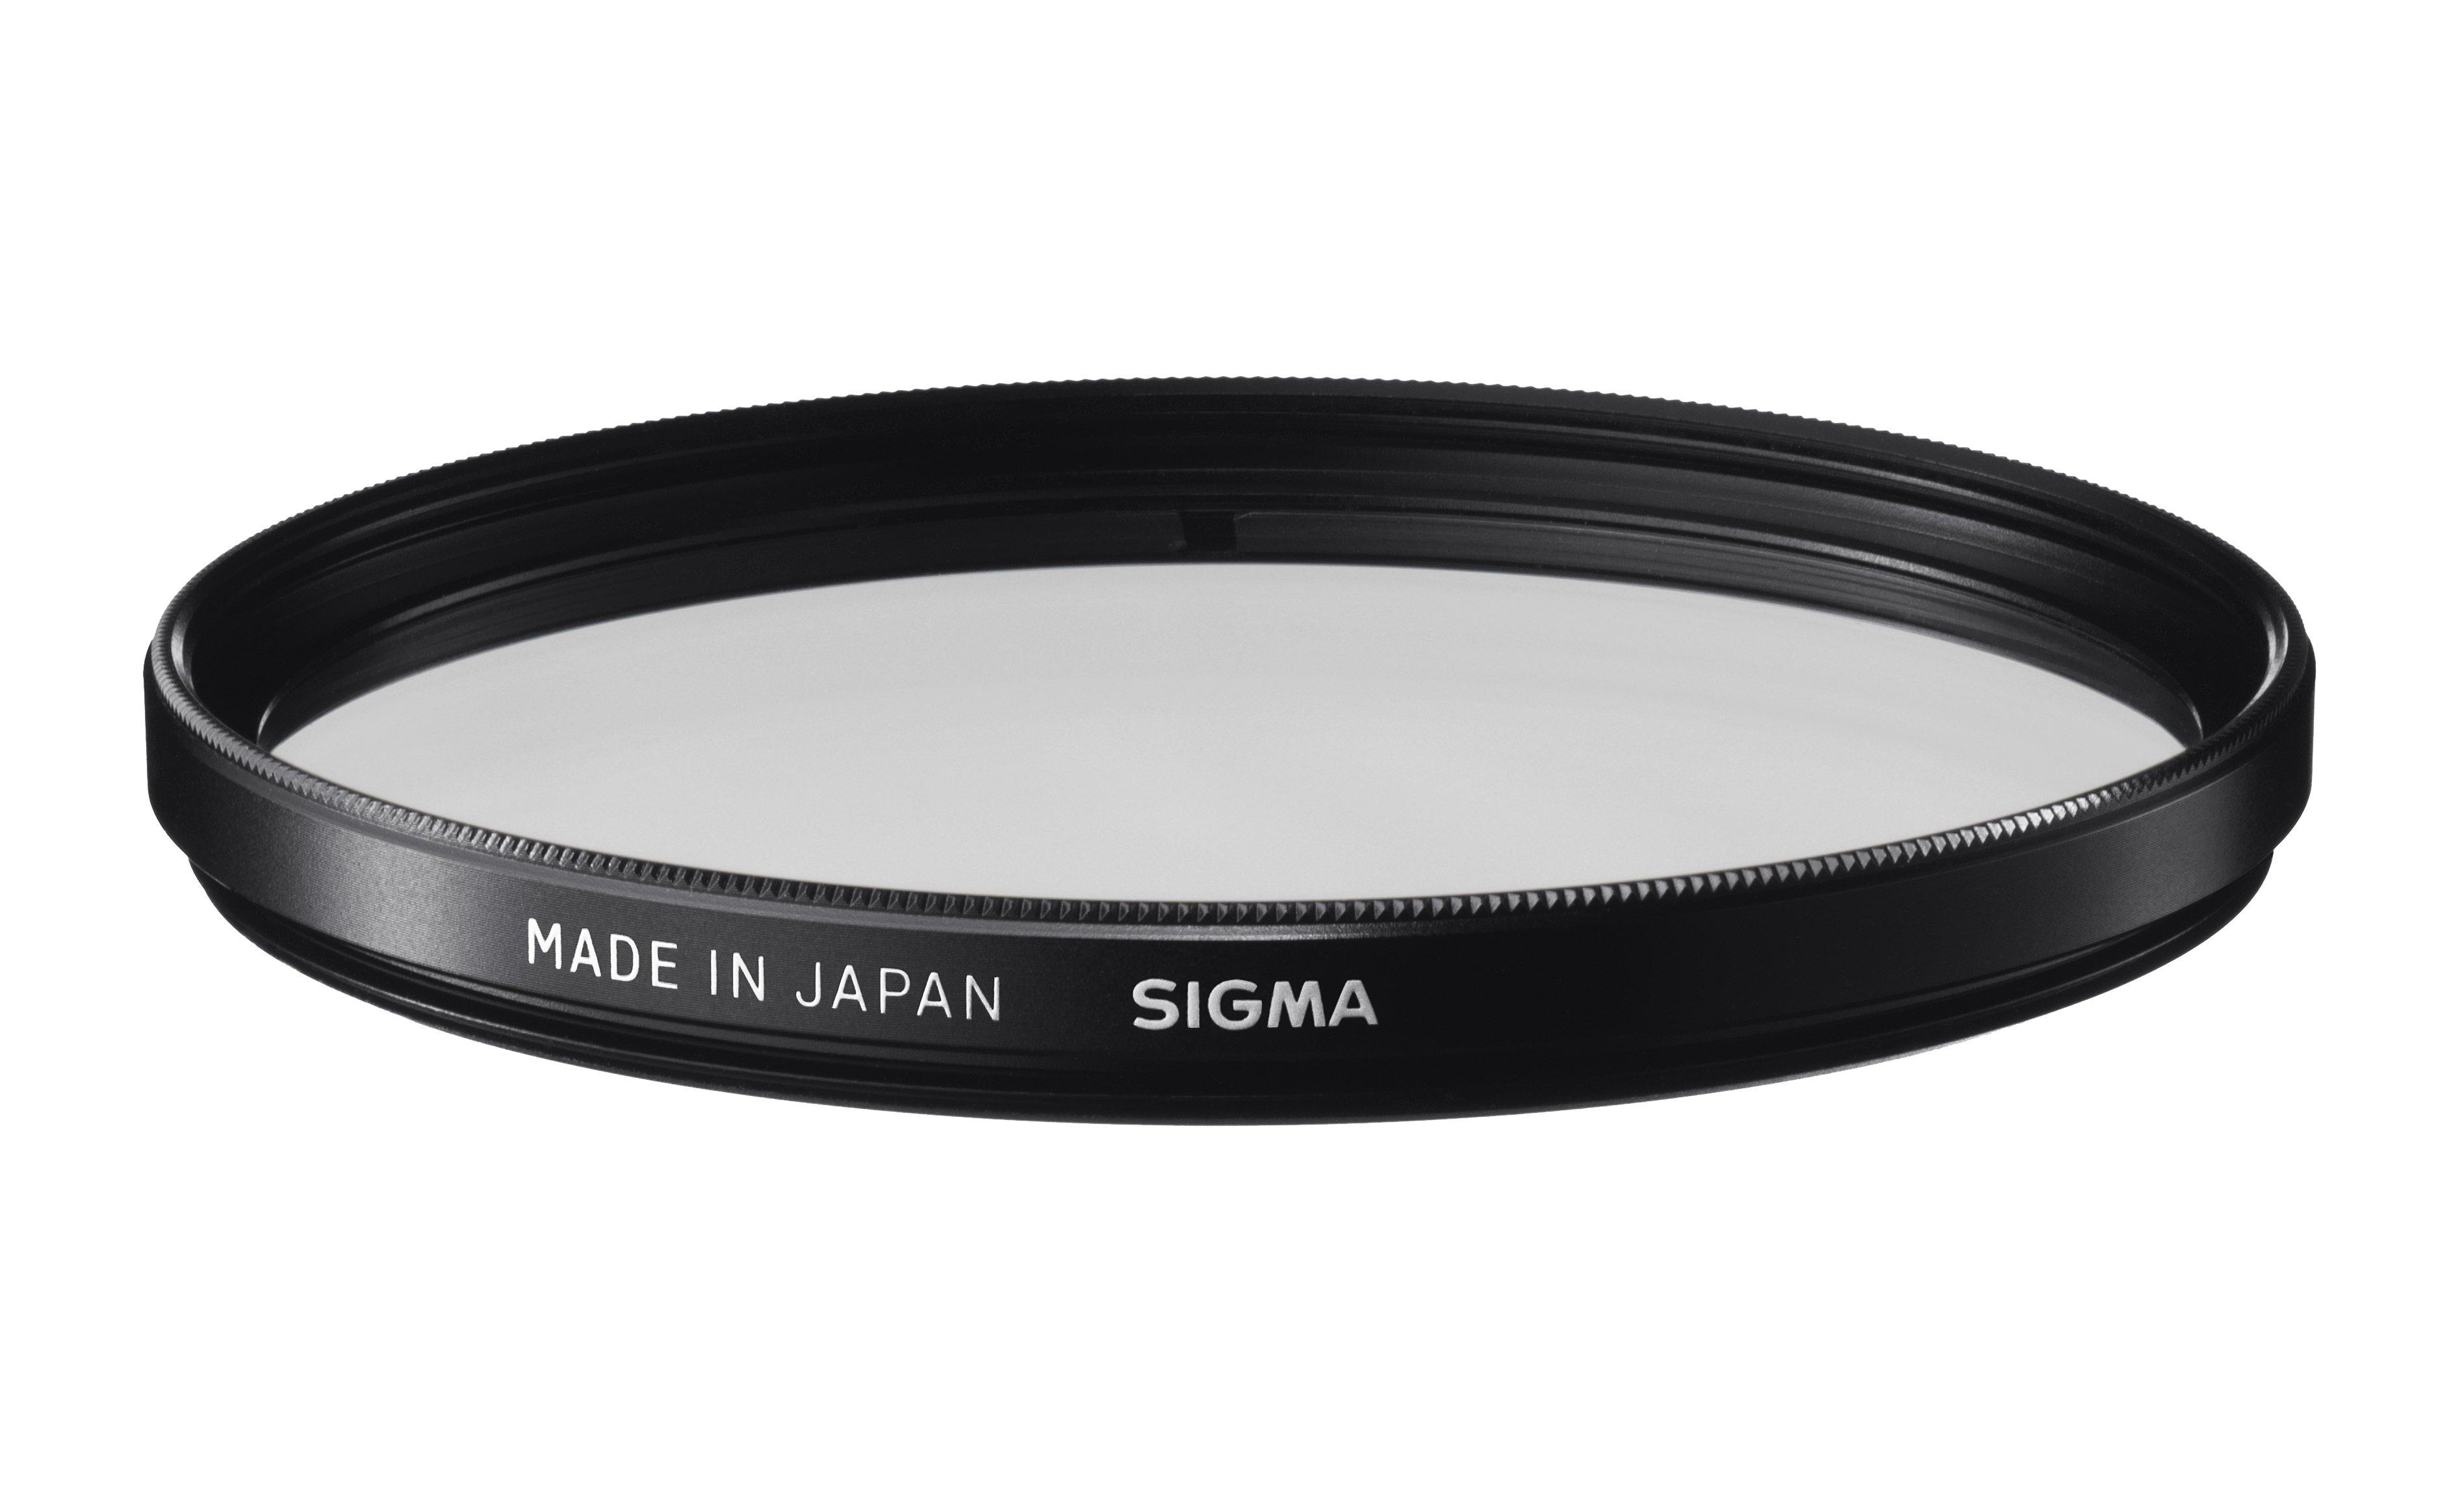 SIGMA filtr UV 49 mm WR